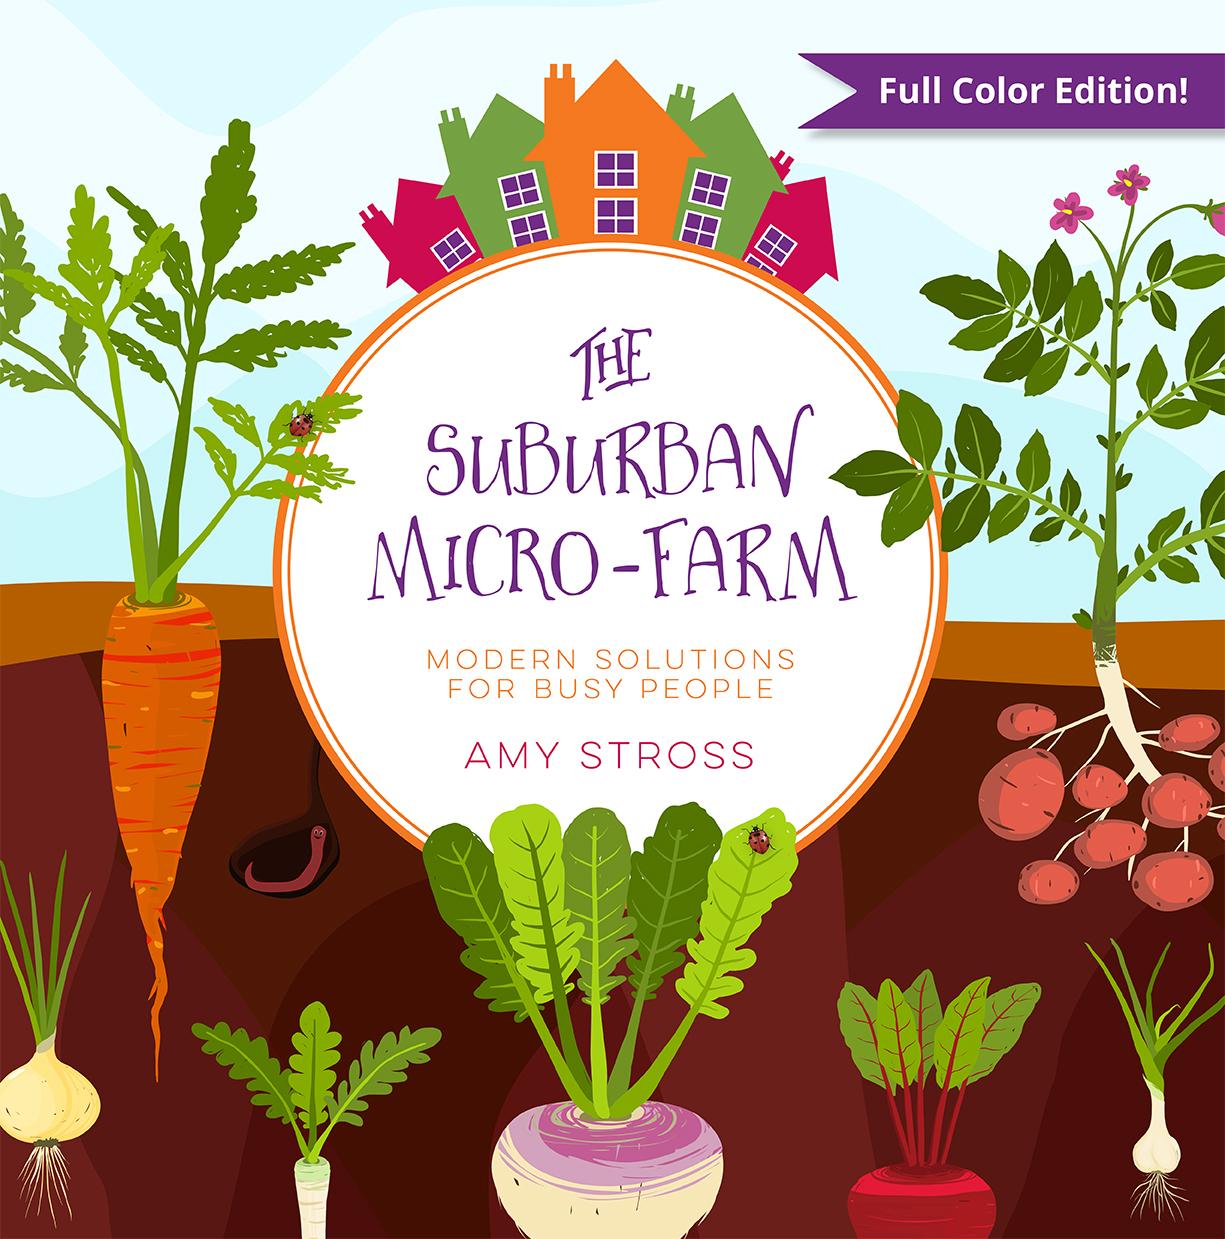 The Suburban Micro Farm